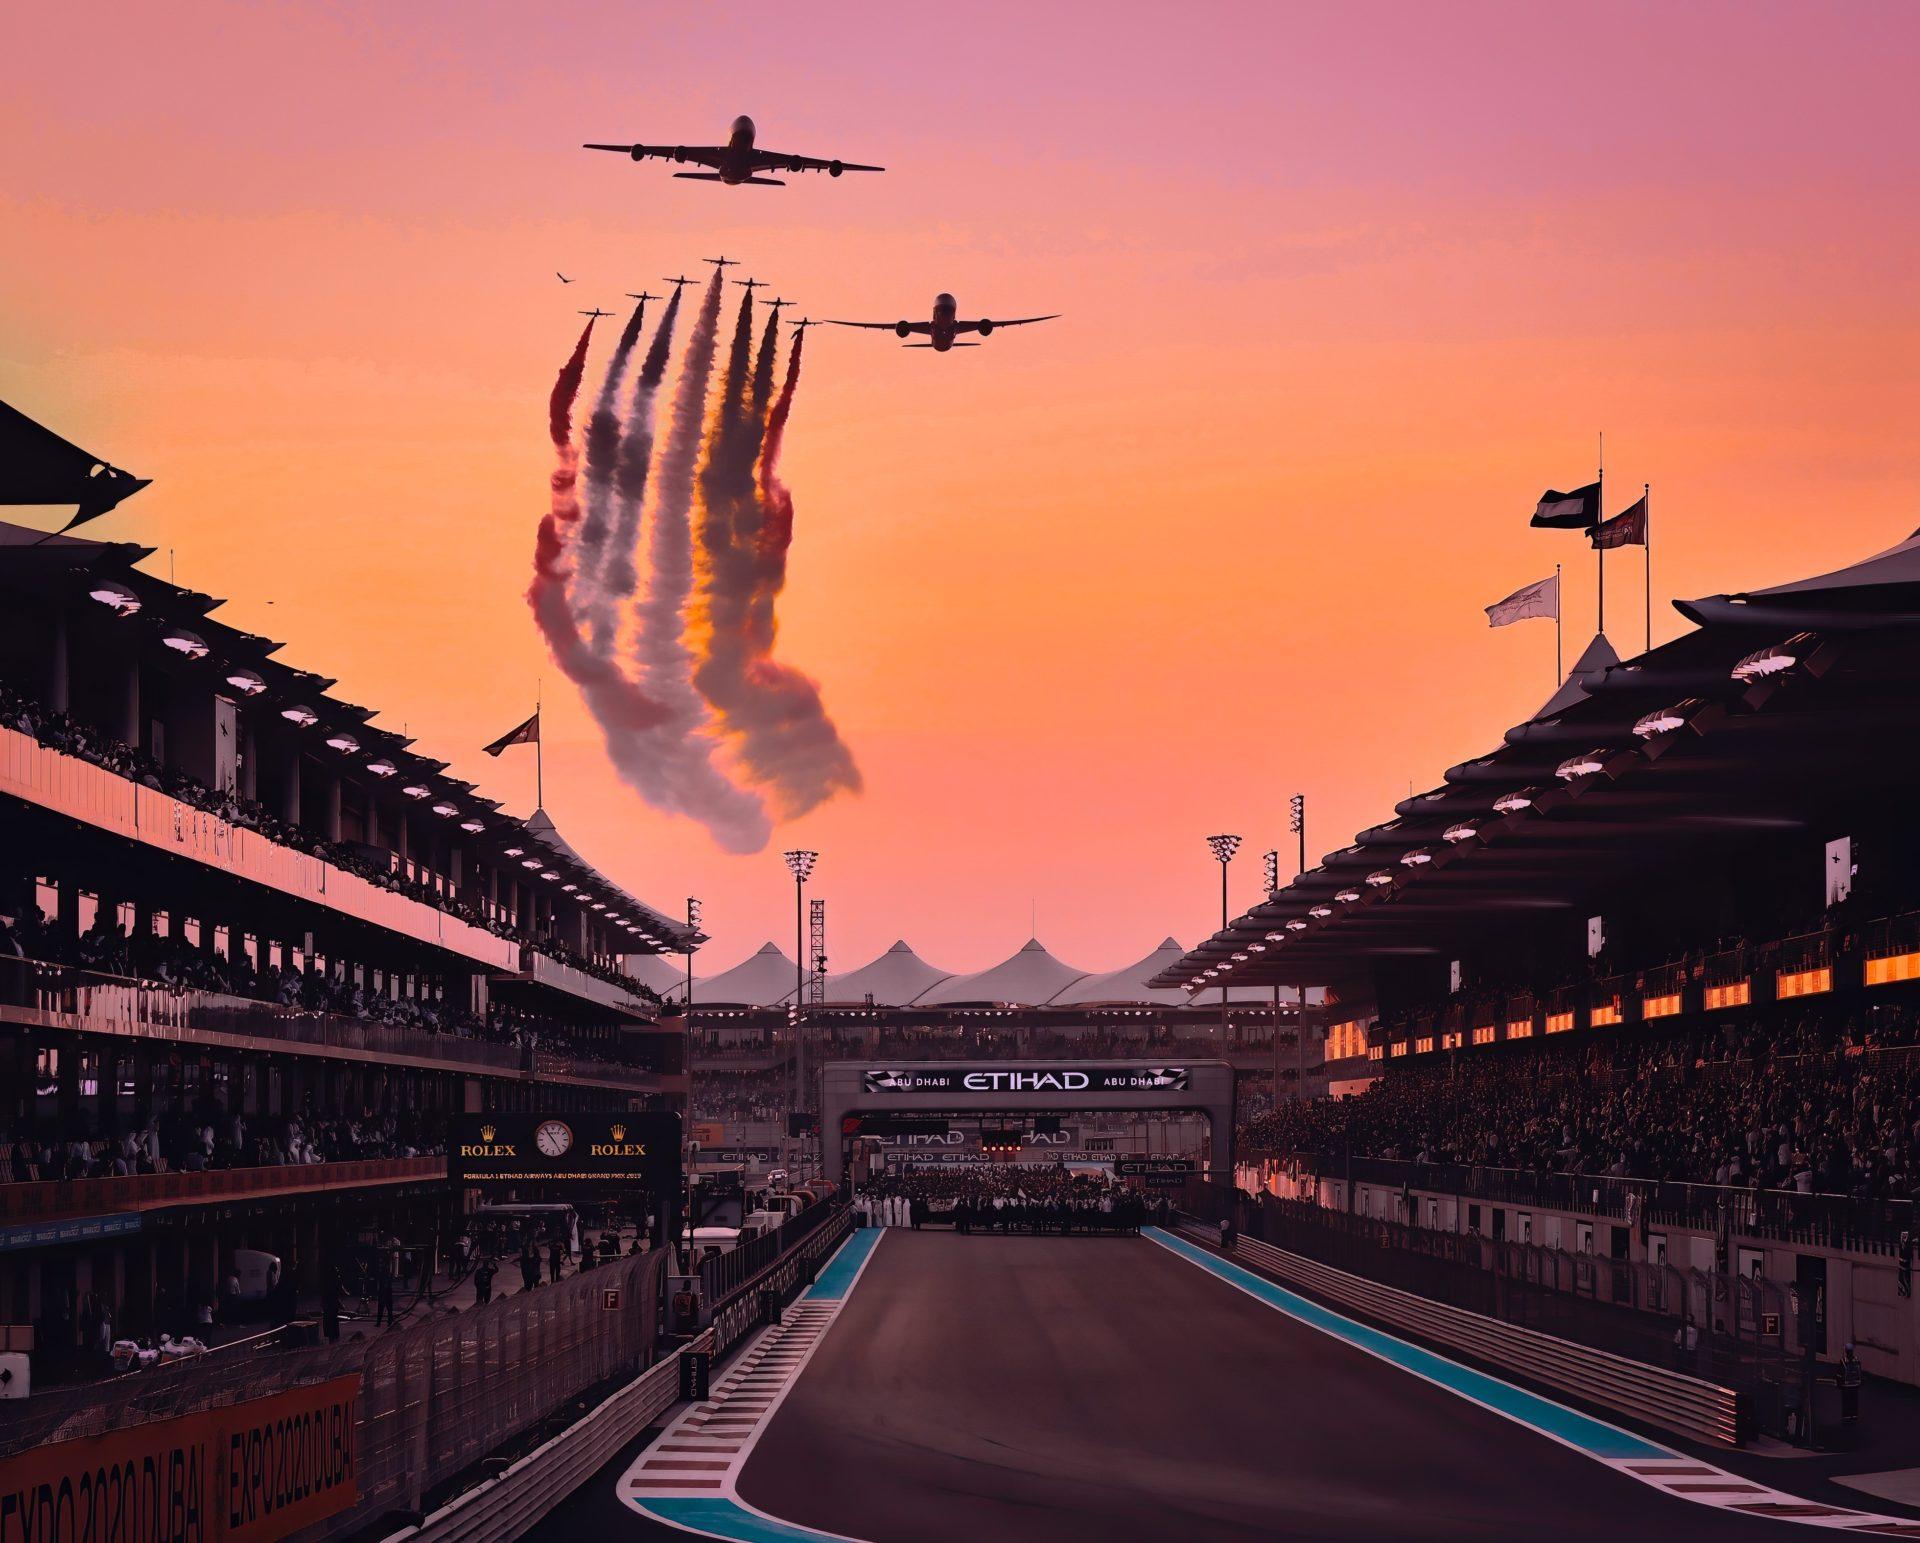 Abu Dhabi Grand Prix Emirates